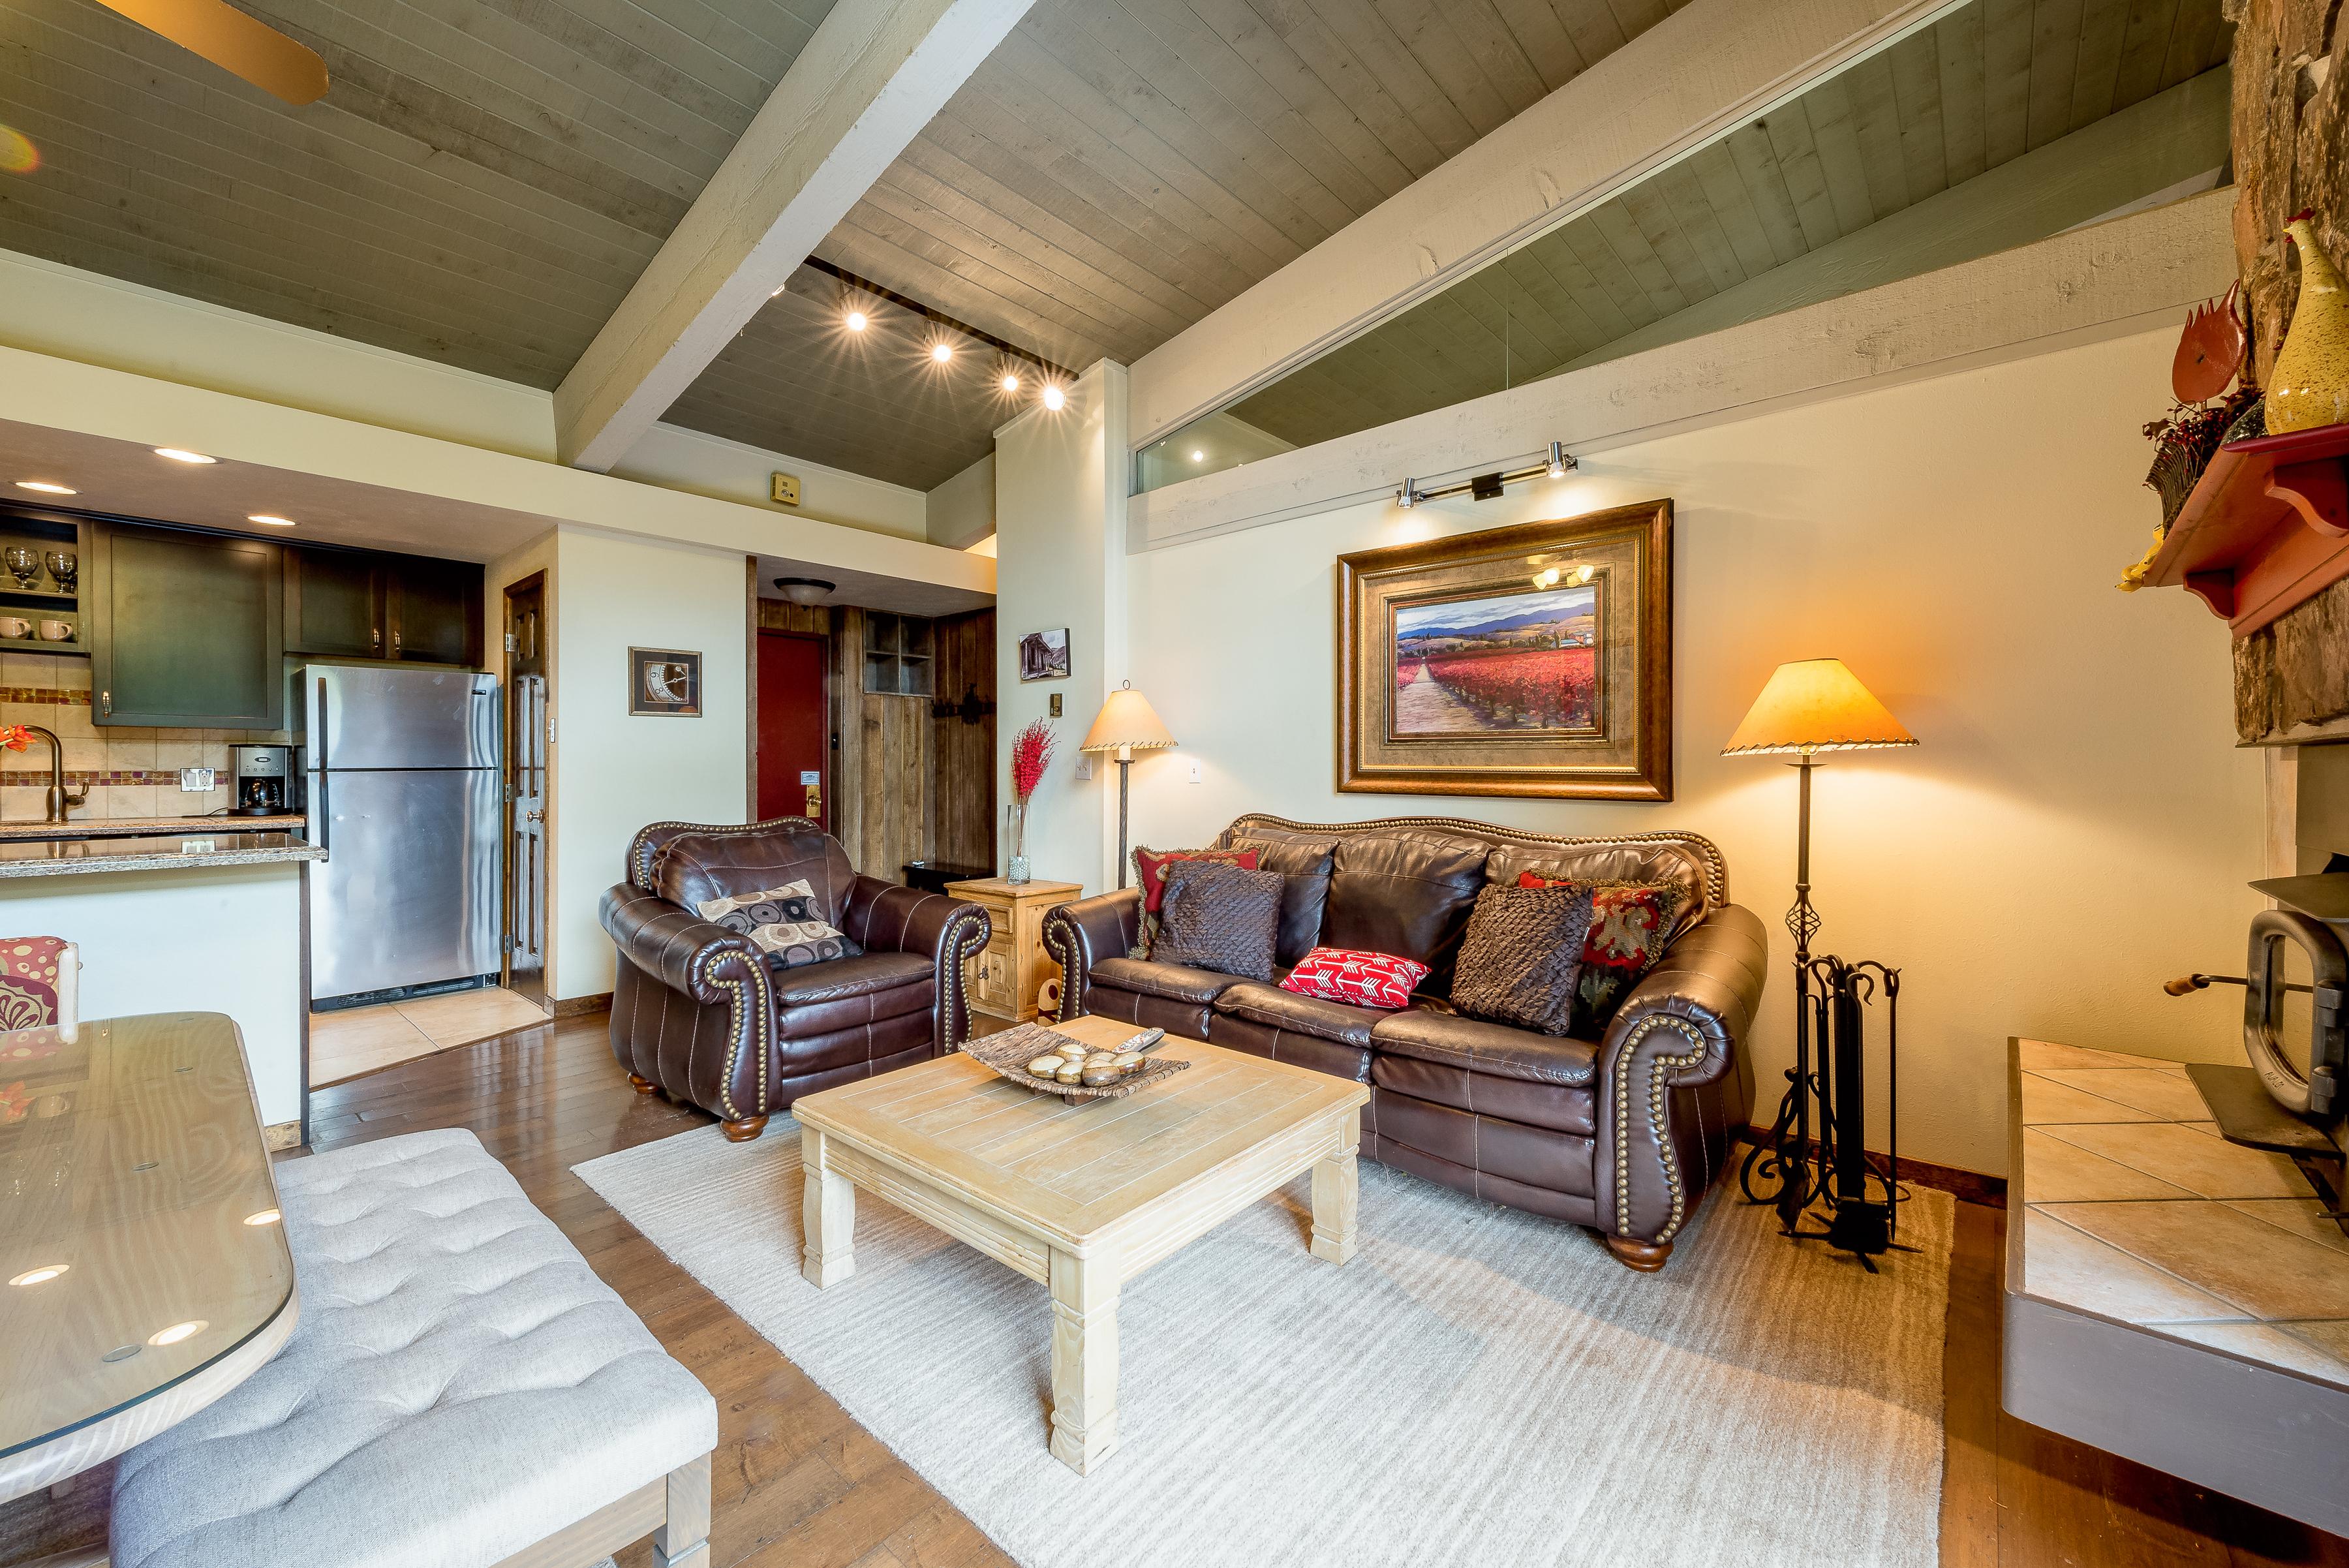 mckenna furniture com mainstays ip small piece meadows set walmart space